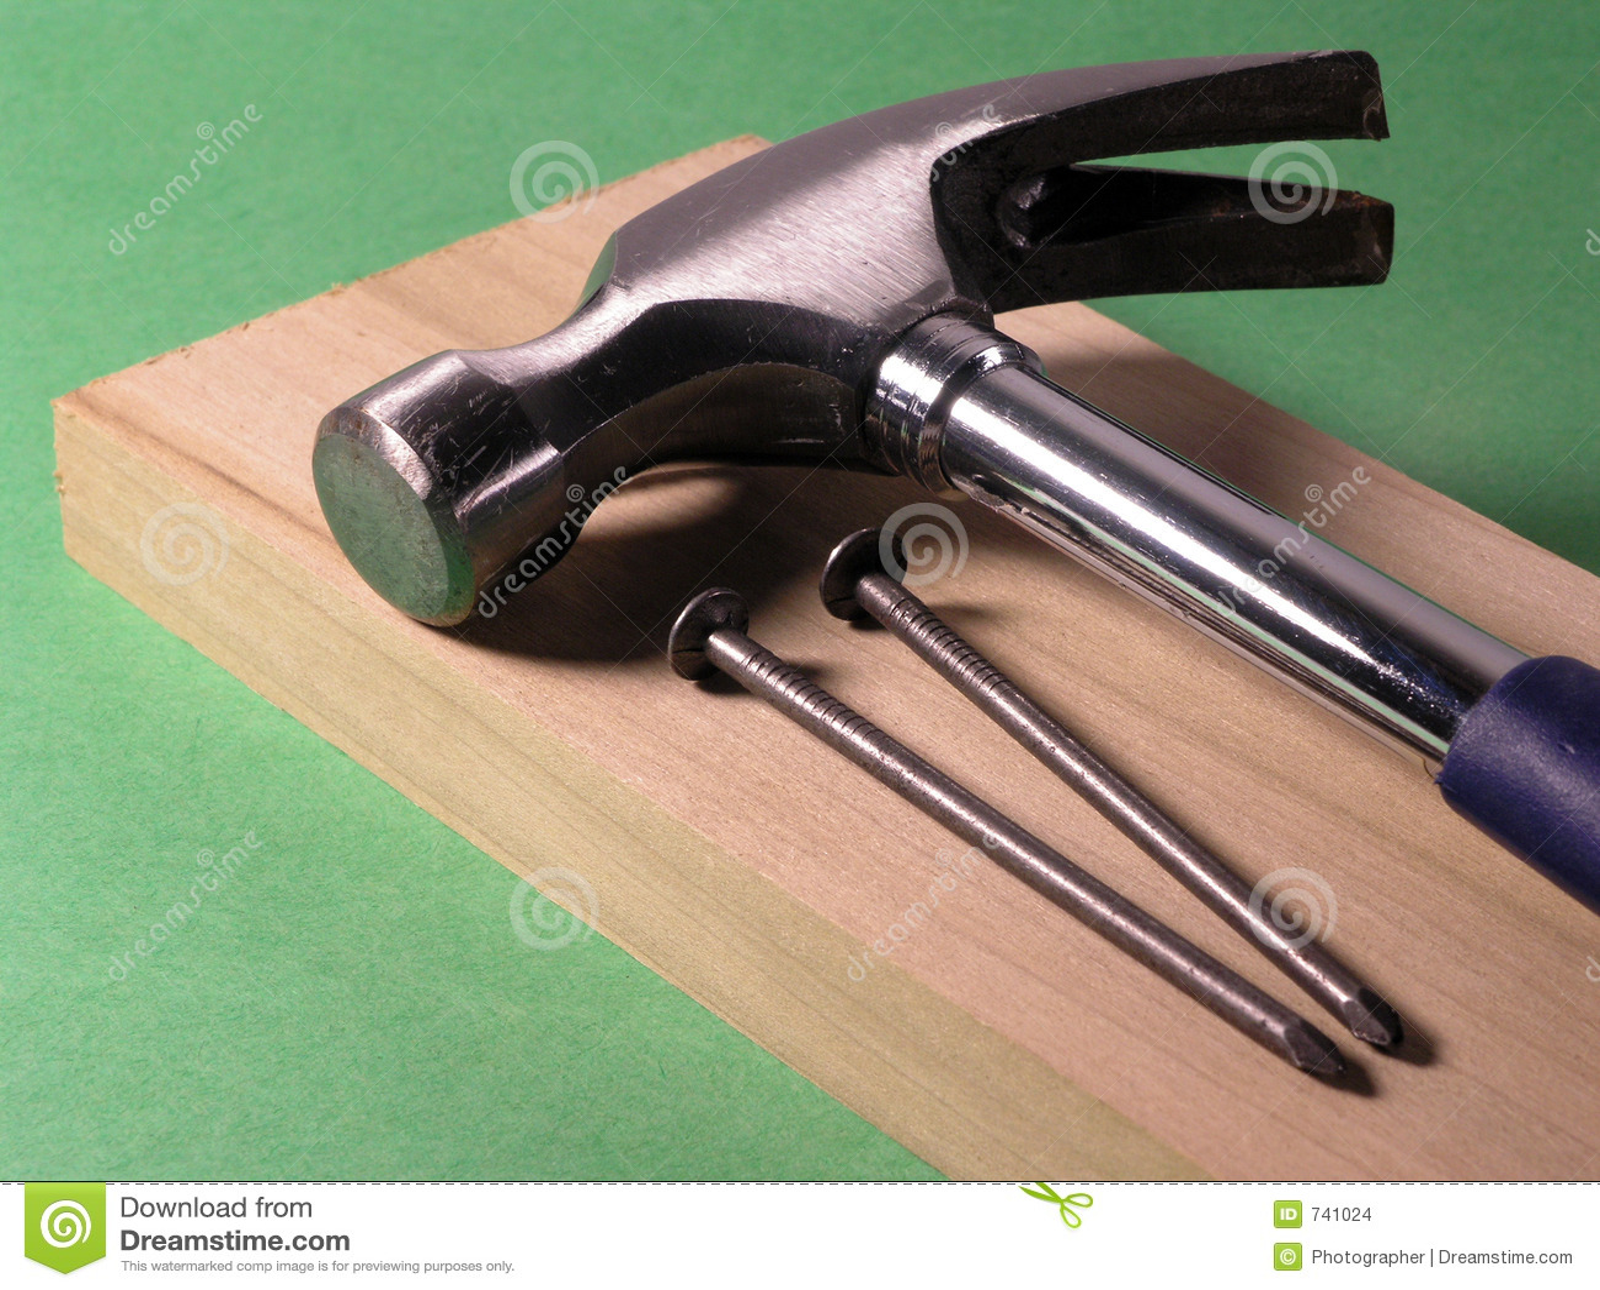 Diy hulpmiddelen voor het huisverbetering stock foto afbeelding 741024 - Huisverbetering m ...